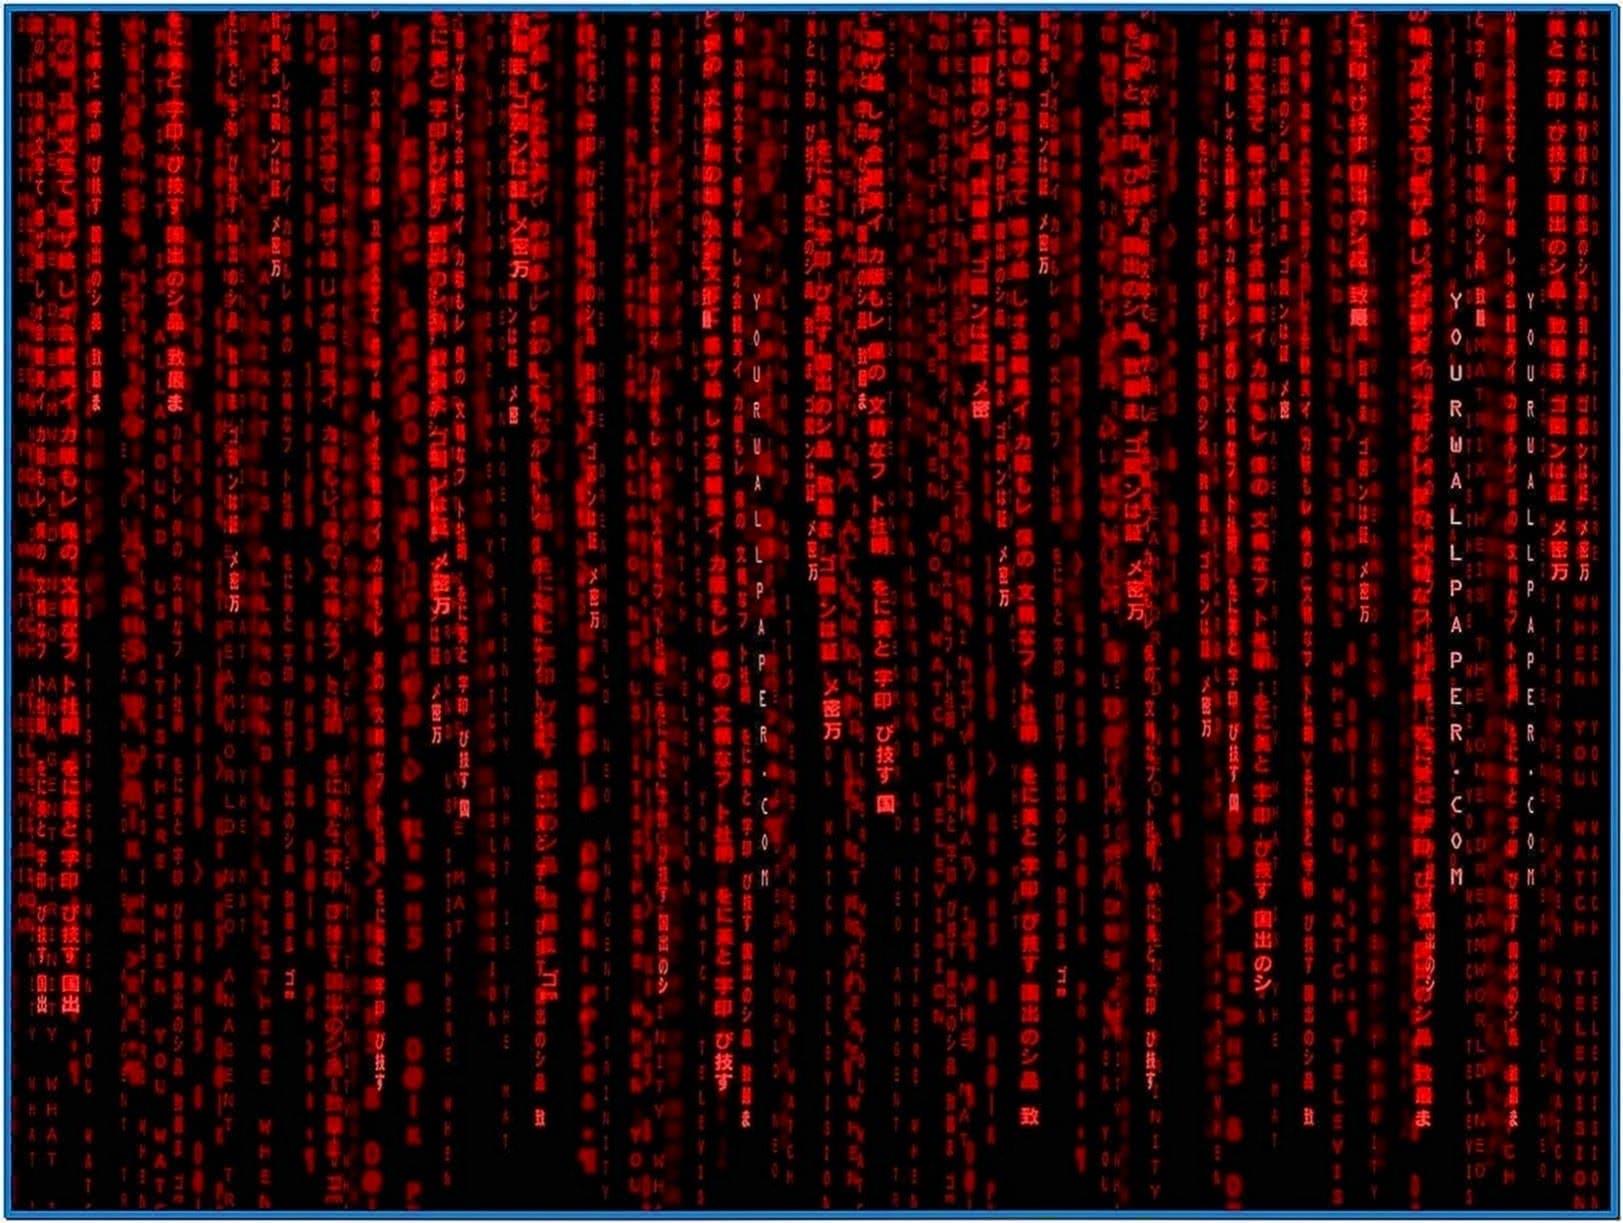 Matrix Code Screensaver Red Download Free